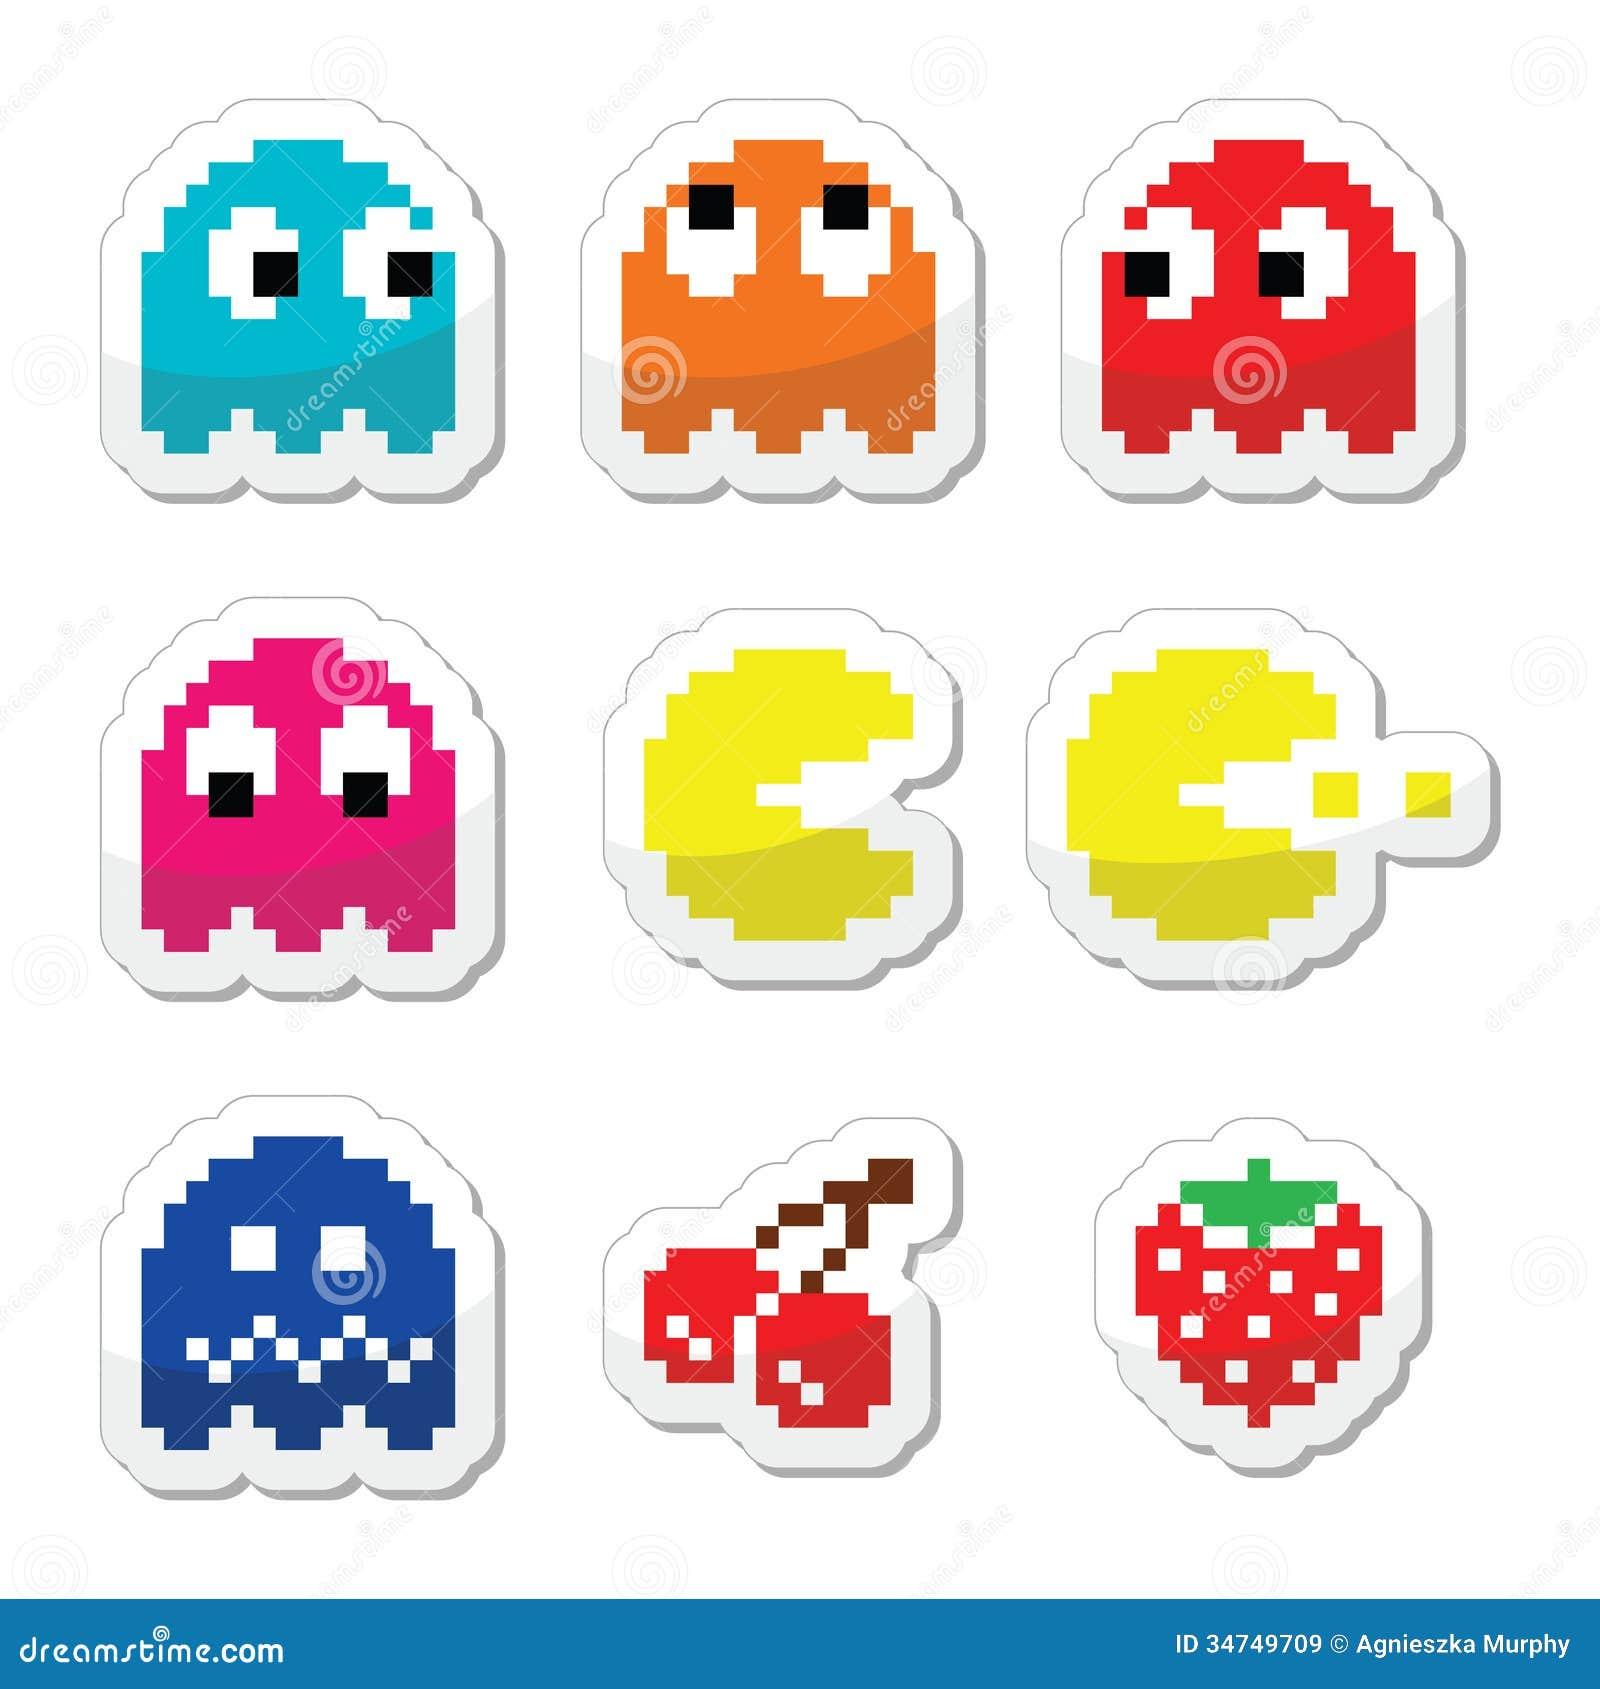 Pacman Images Free | Wallpaper sportstle